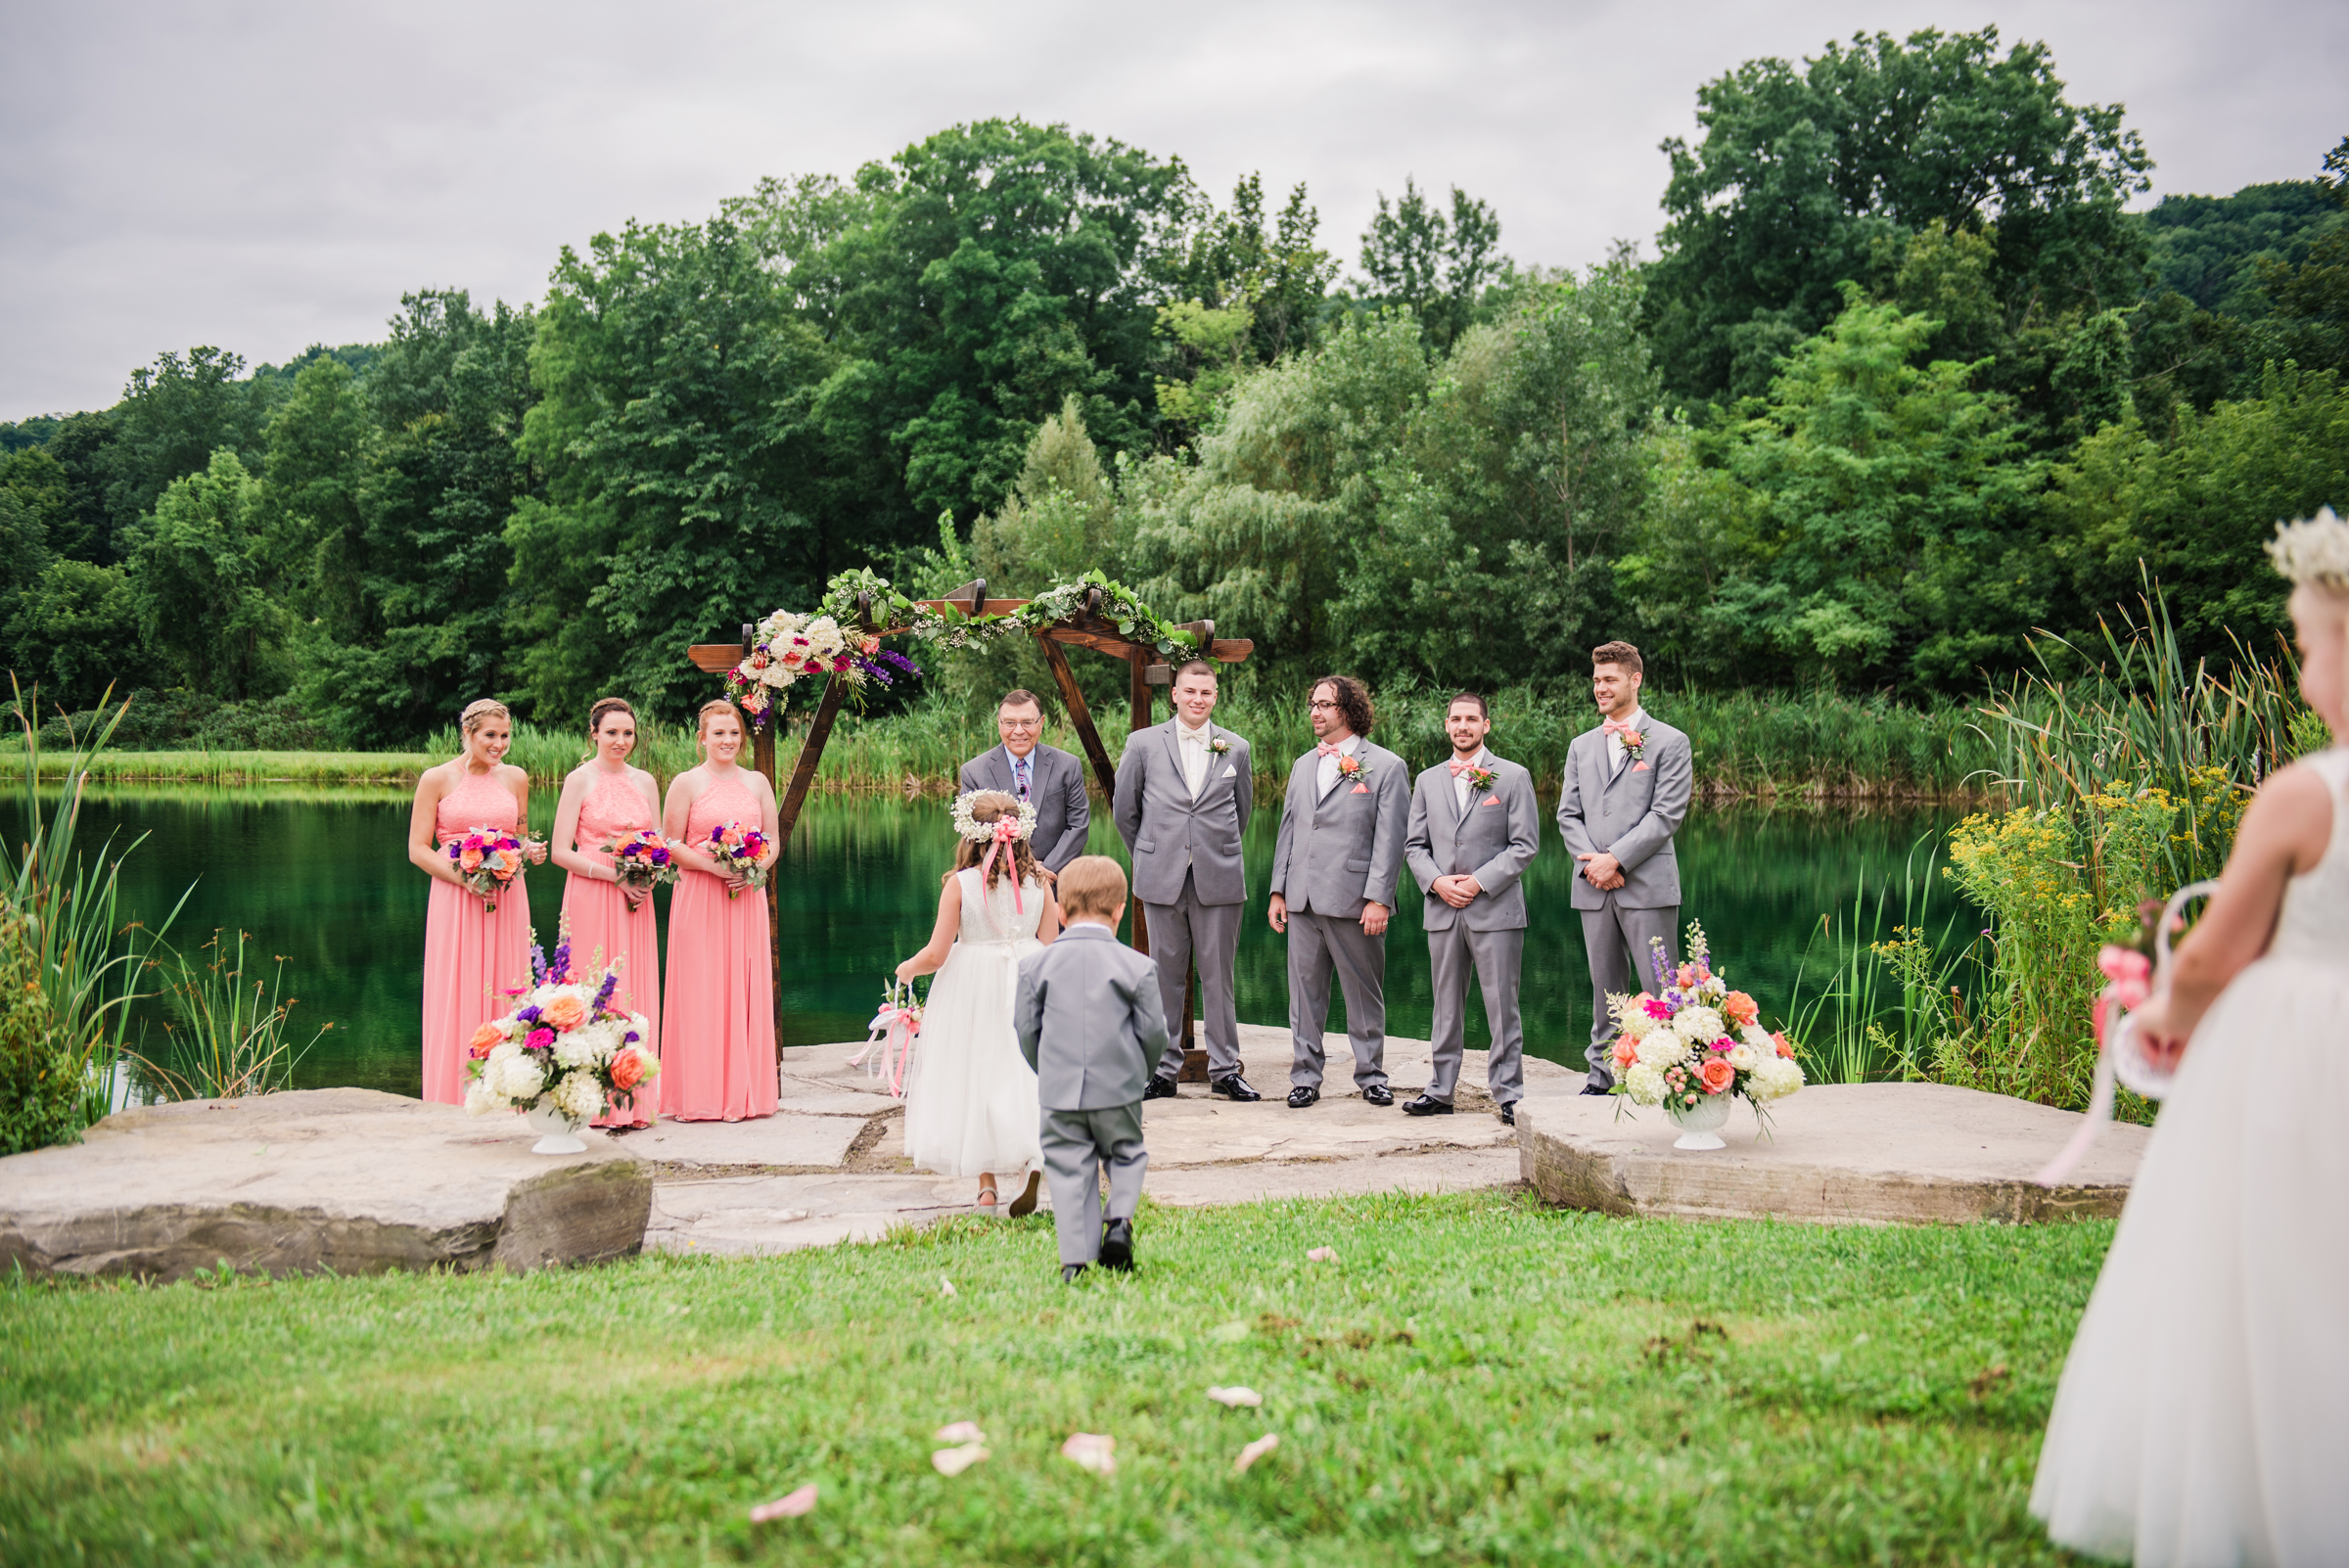 Wolf_Oak_Acres_Central_NY_Wedding_JILL_STUDIO_Rochester_NY_Photographer_DSC_8435.jpg